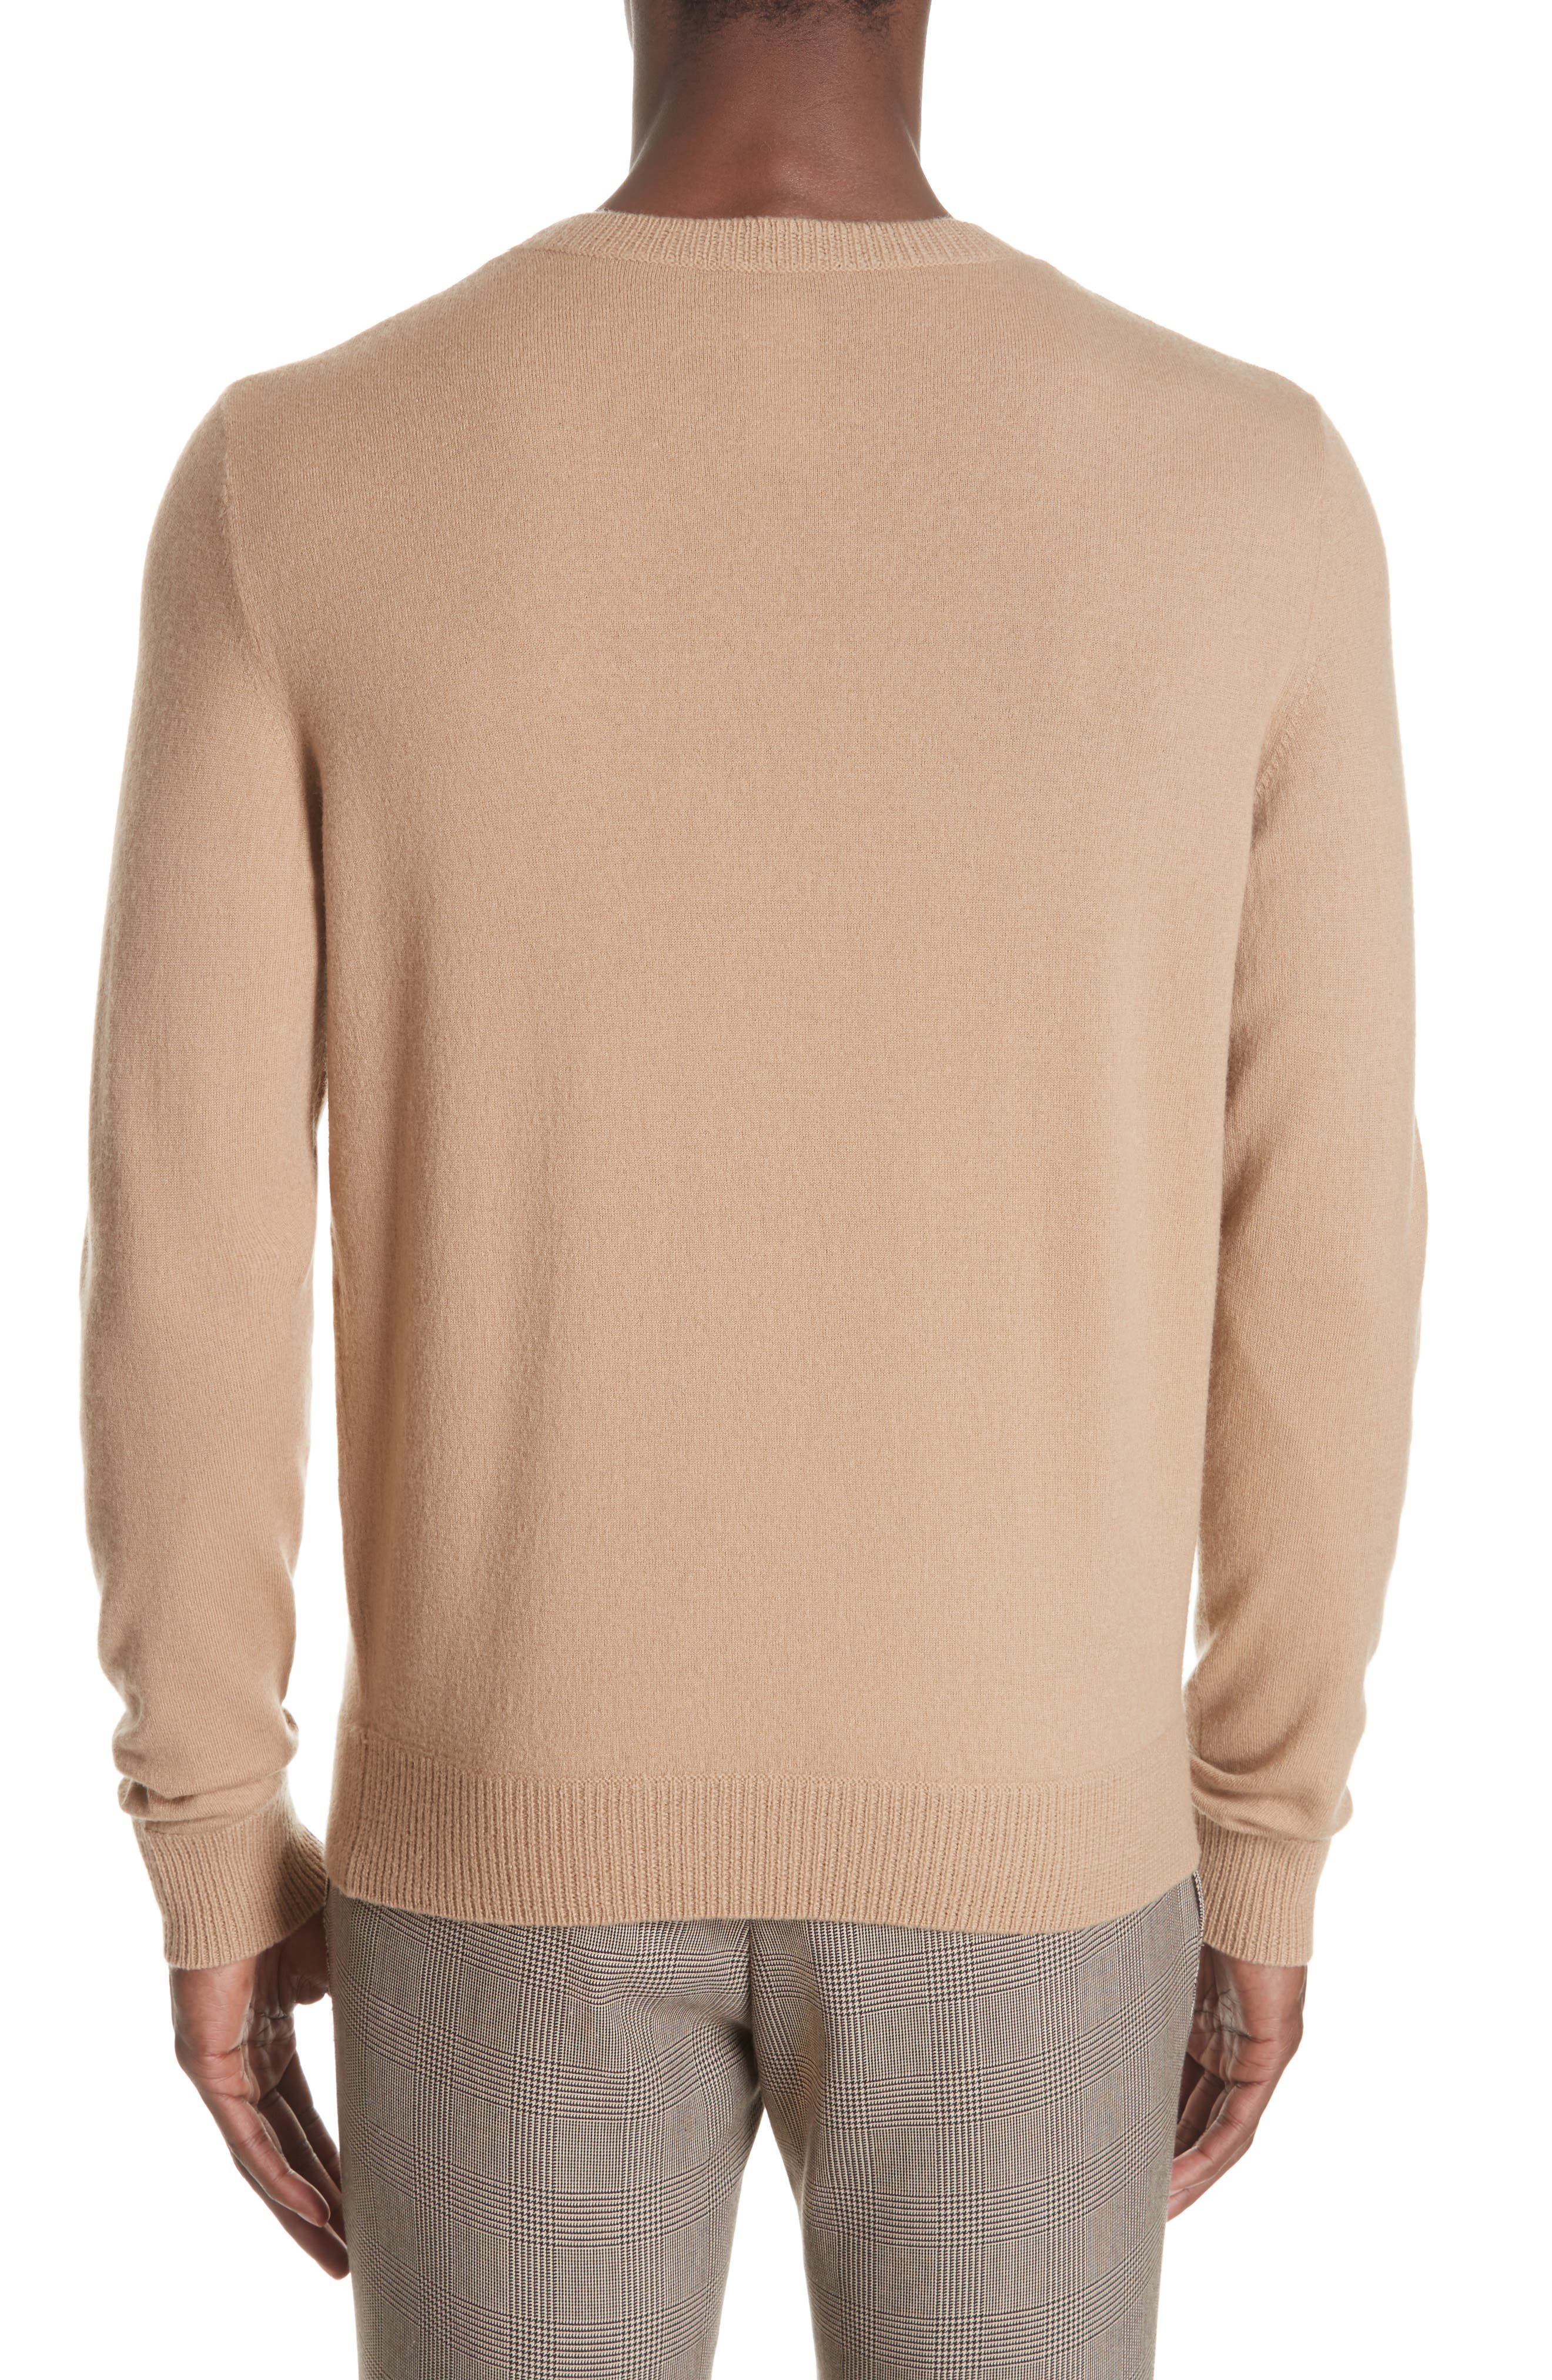 Merino Wool Crewneck Sweater,                             Alternate thumbnail 2, color,                             240